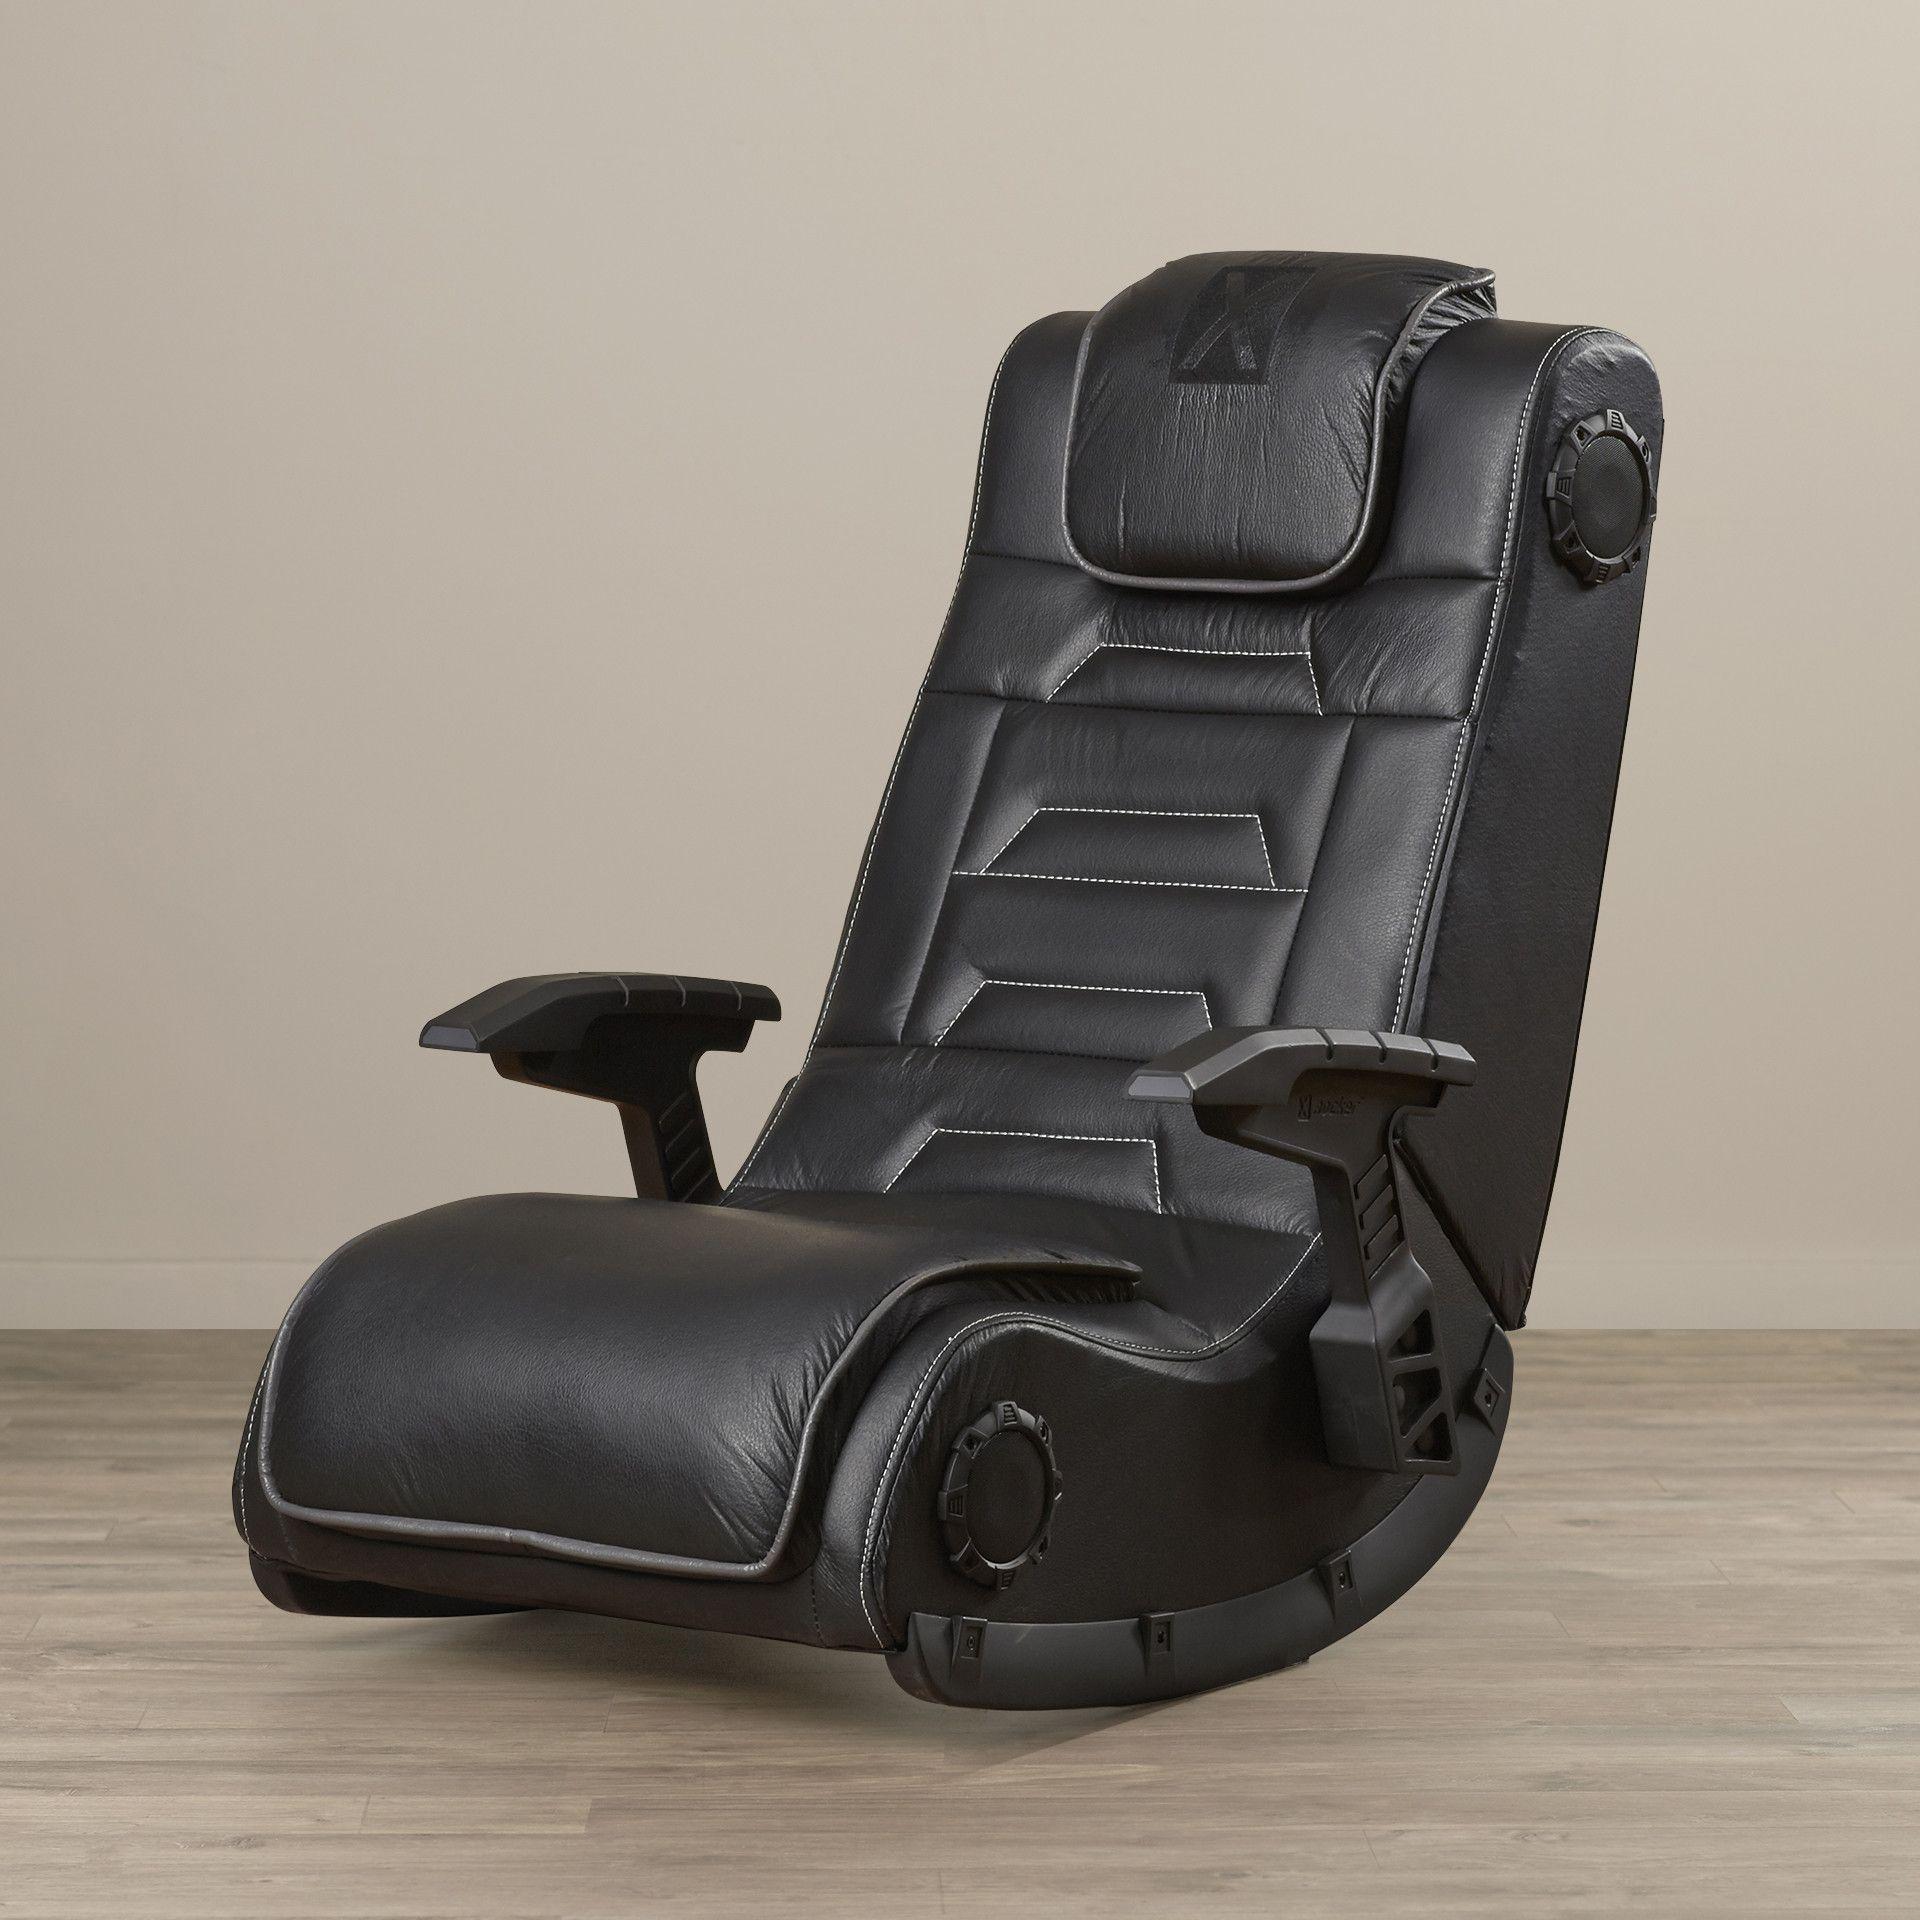 Wireless Video Rocker Game Chair